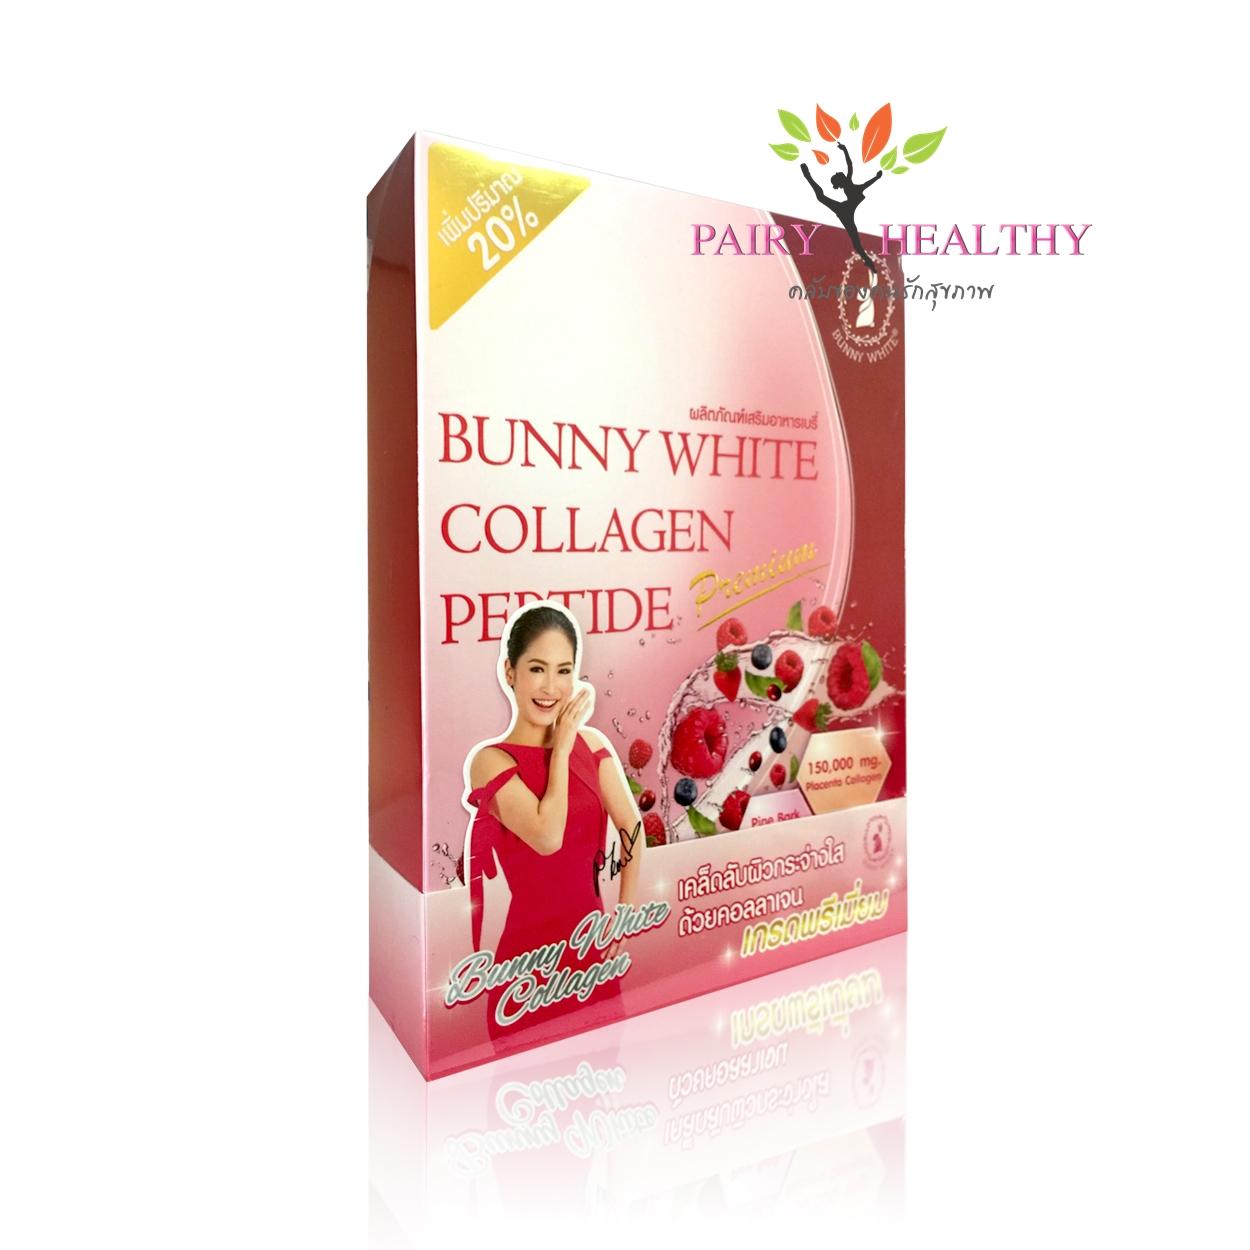 Bunny White Collagen 50,000 mg บันนี่ไวท์ คอลลาเจน 15 ซอง ราคา 840 บาท ส่งฟรี EMS [ไม่ต้องโอนค่าส่ง]